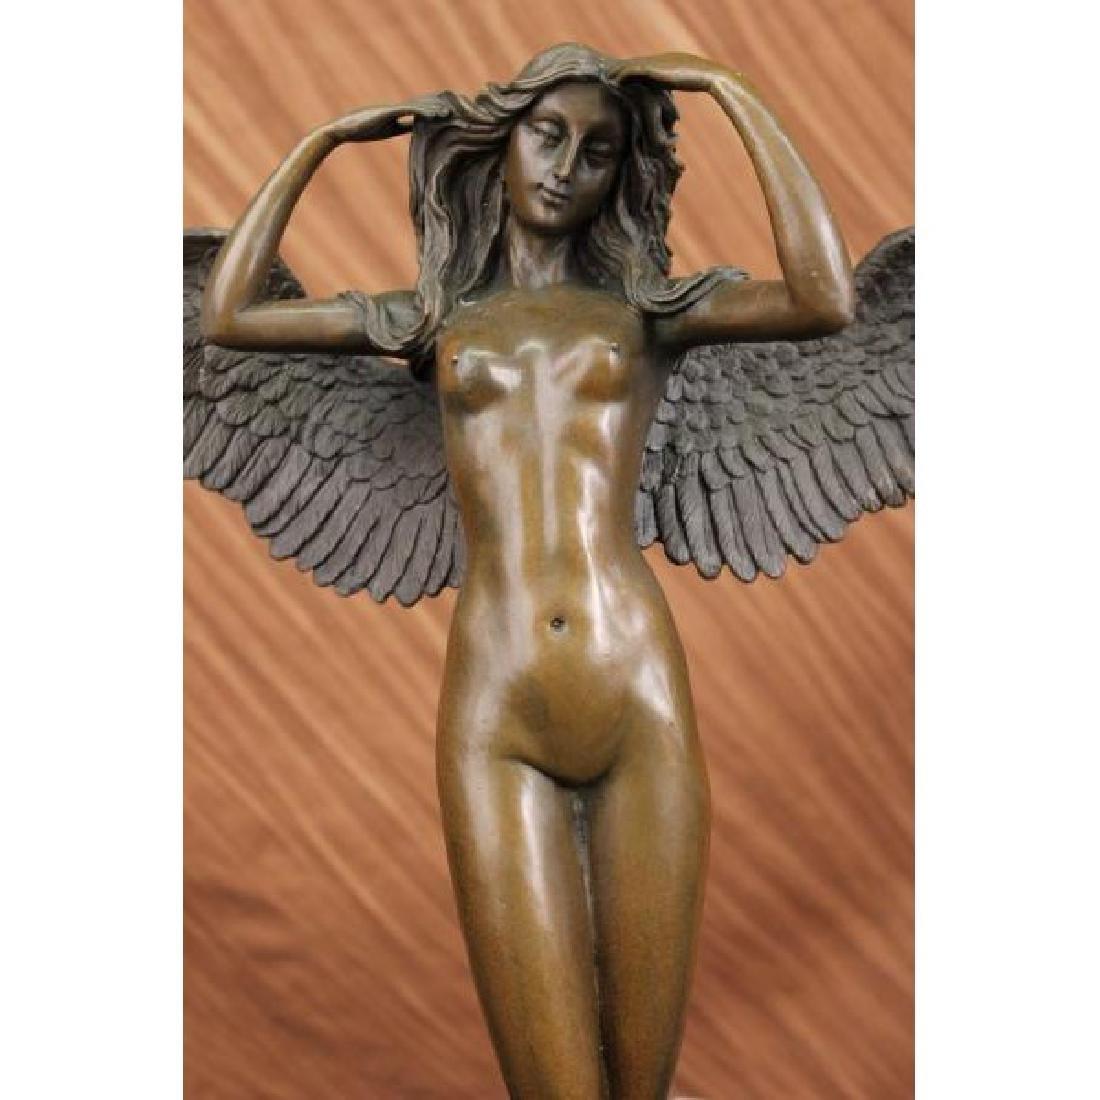 HUGE NUDE LADY ANGEL BRONZE STATUE BY WEINMAN MARBLE